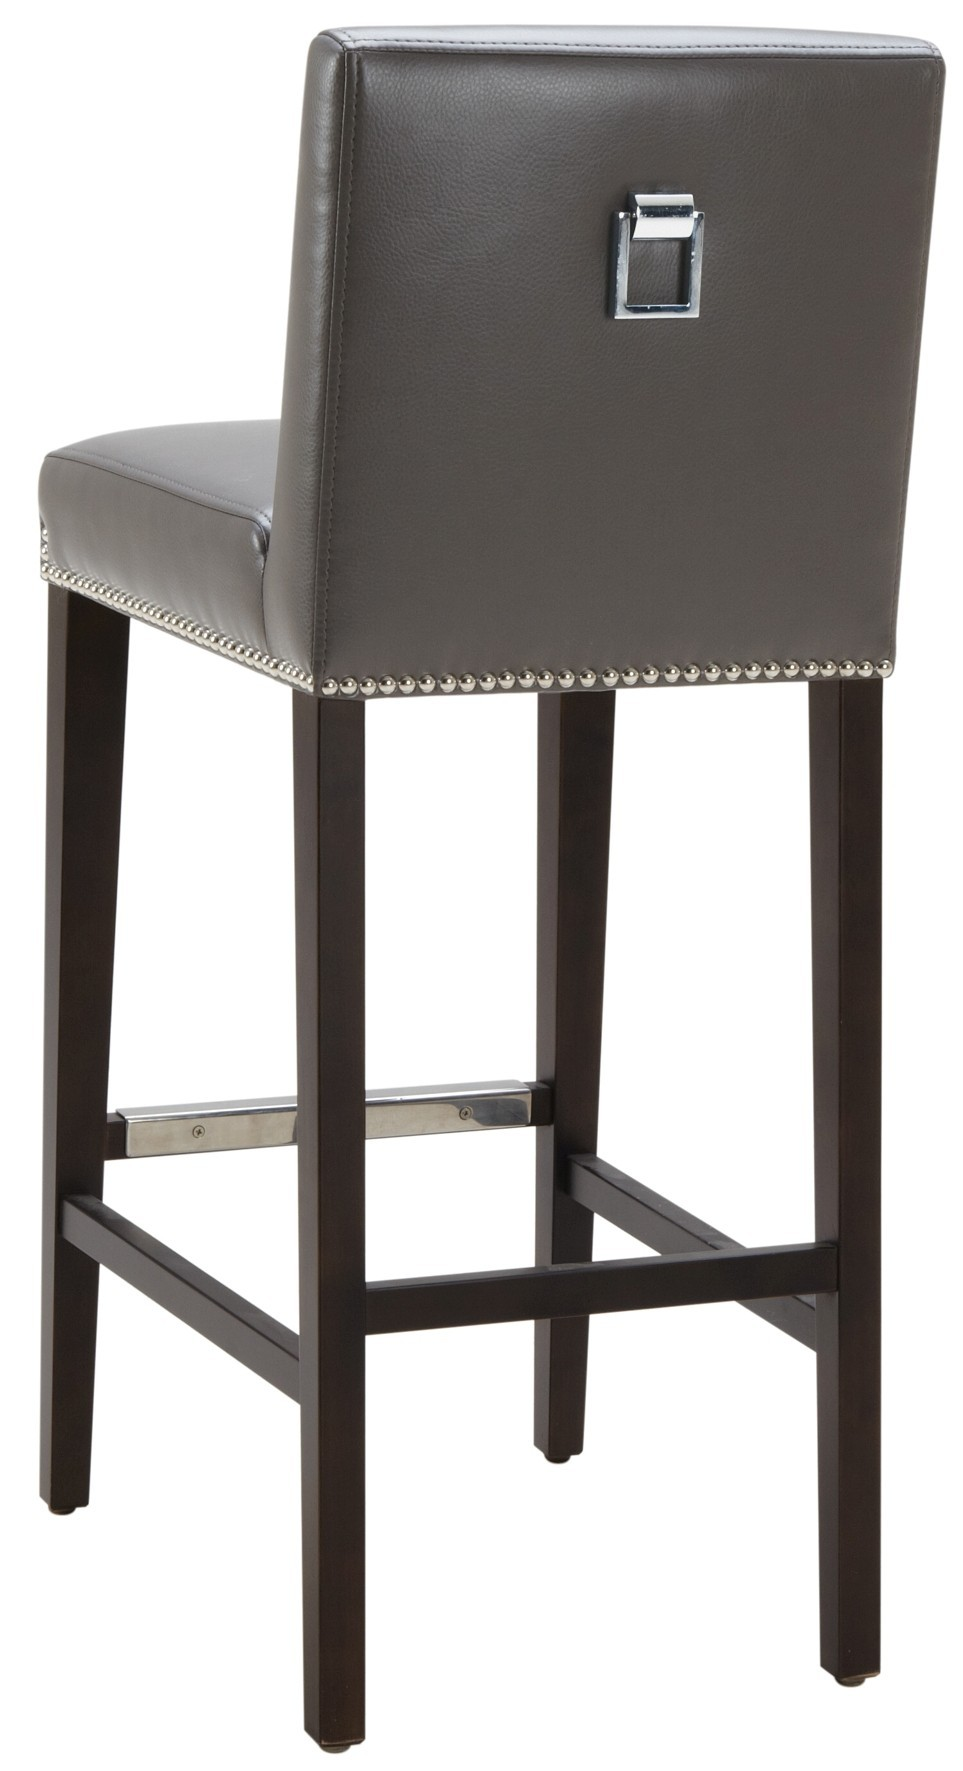 Brooke Grey Barstool From Sunpan 48408 Coleman Furniture